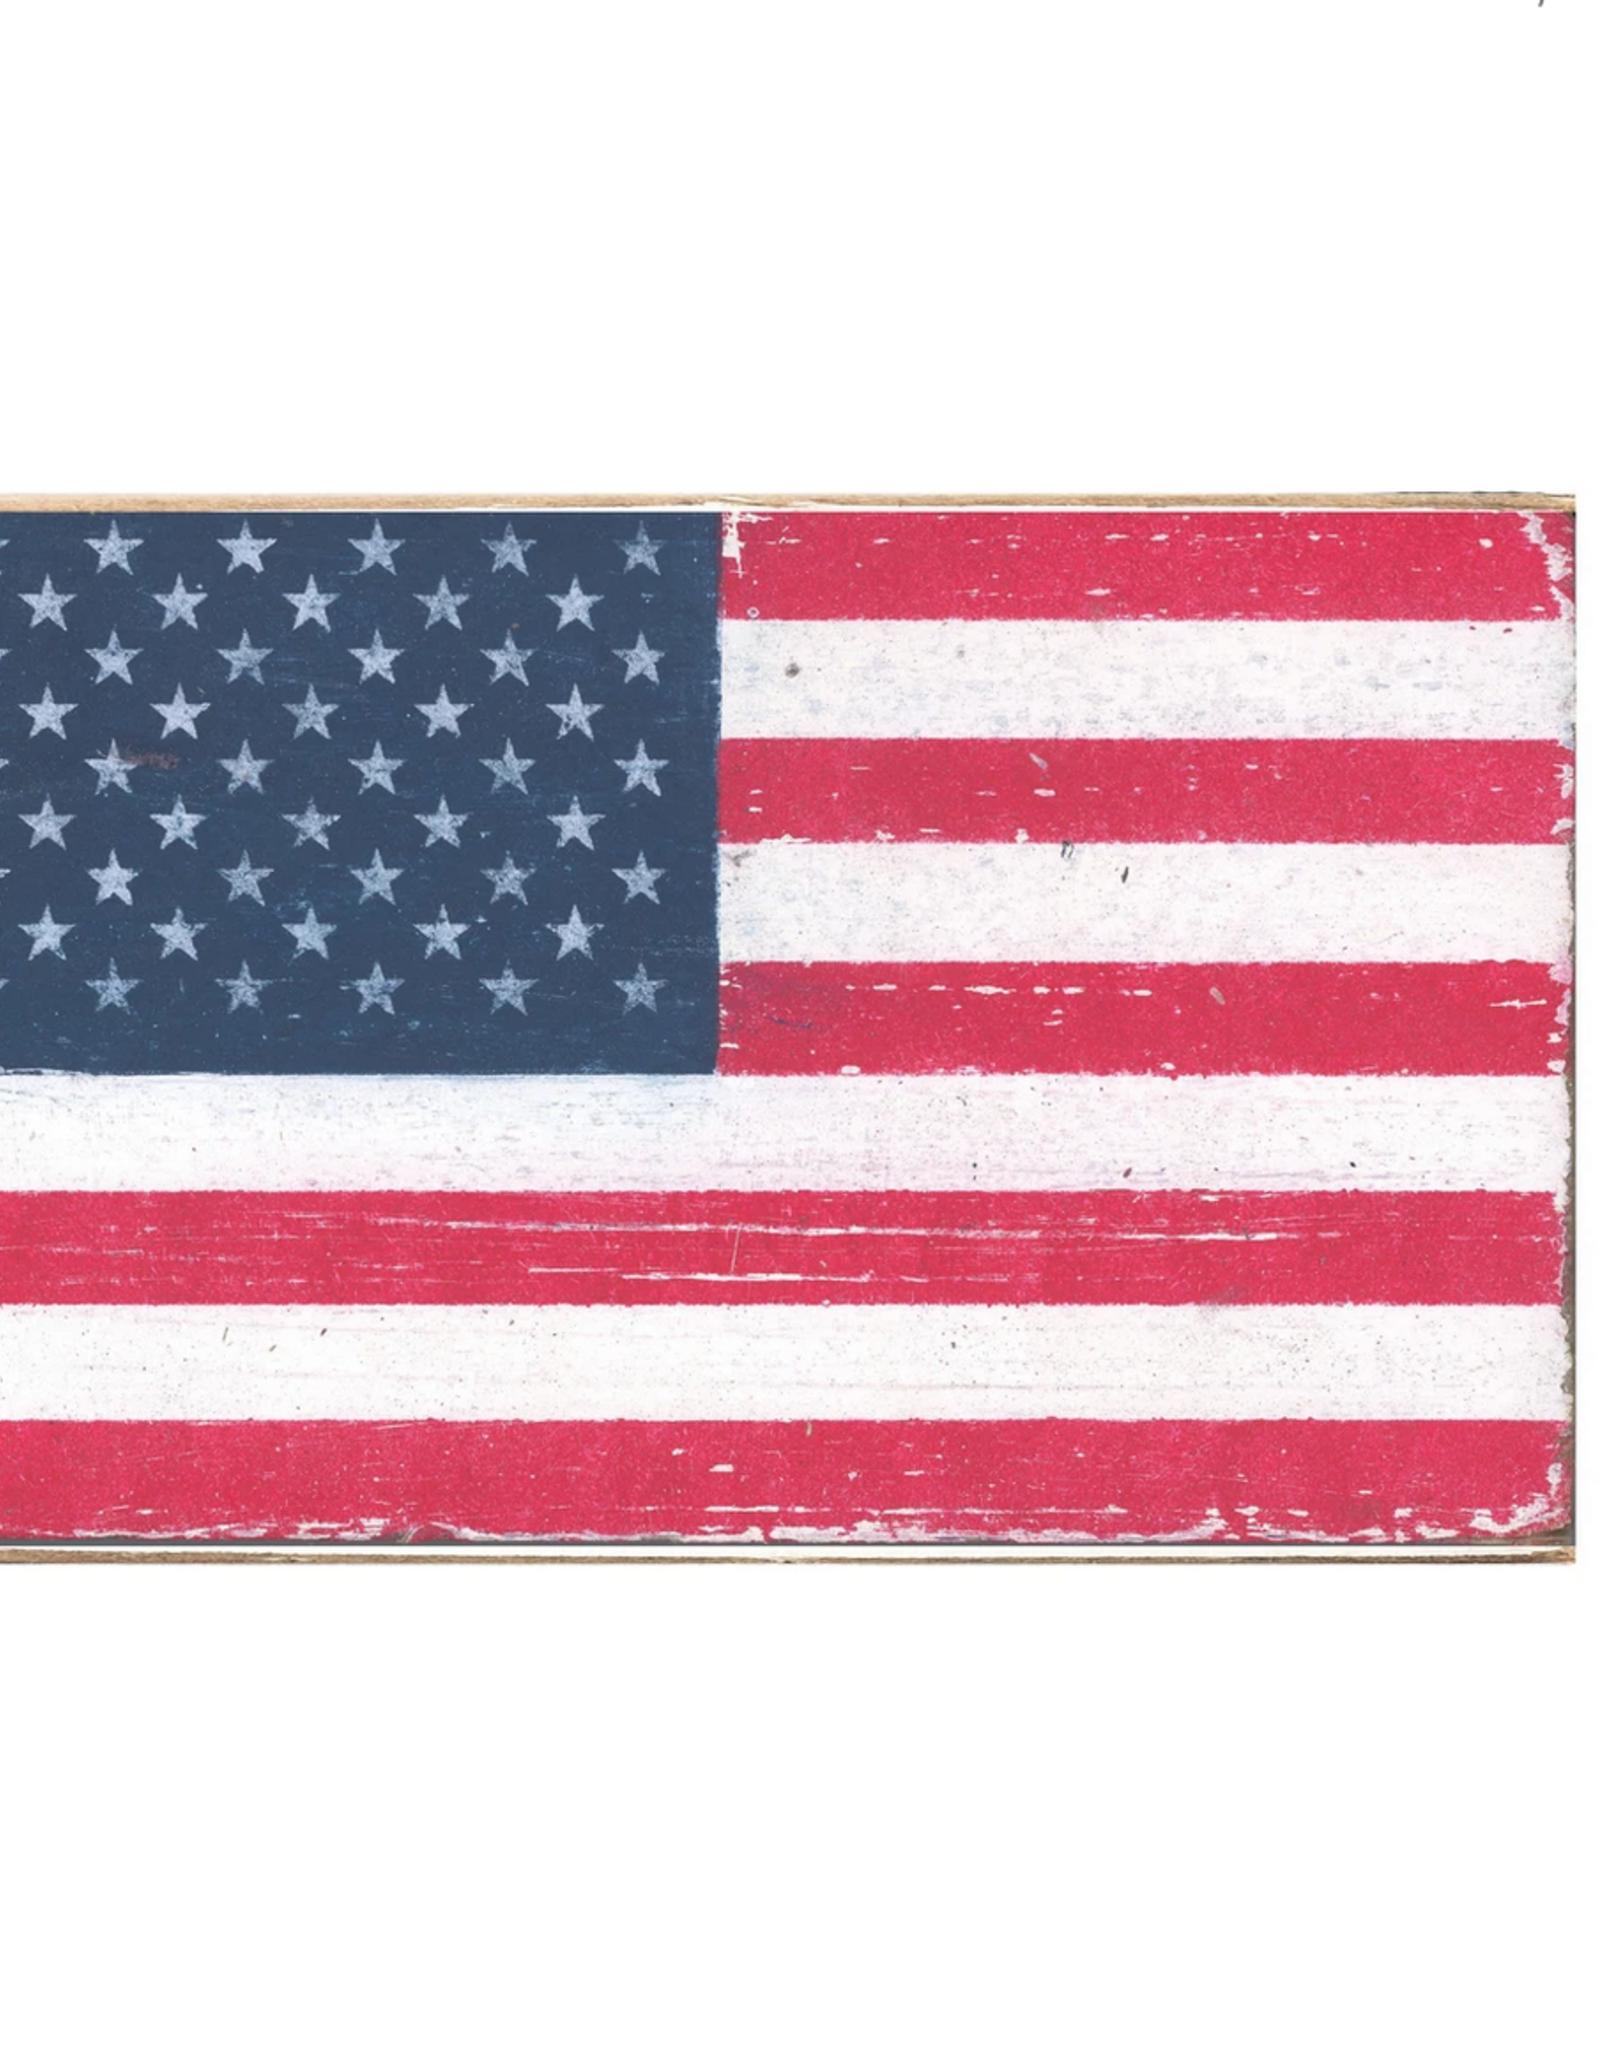 Rustic Marlin Rustic Marlin - XL Blocks Flag - 50 Stars